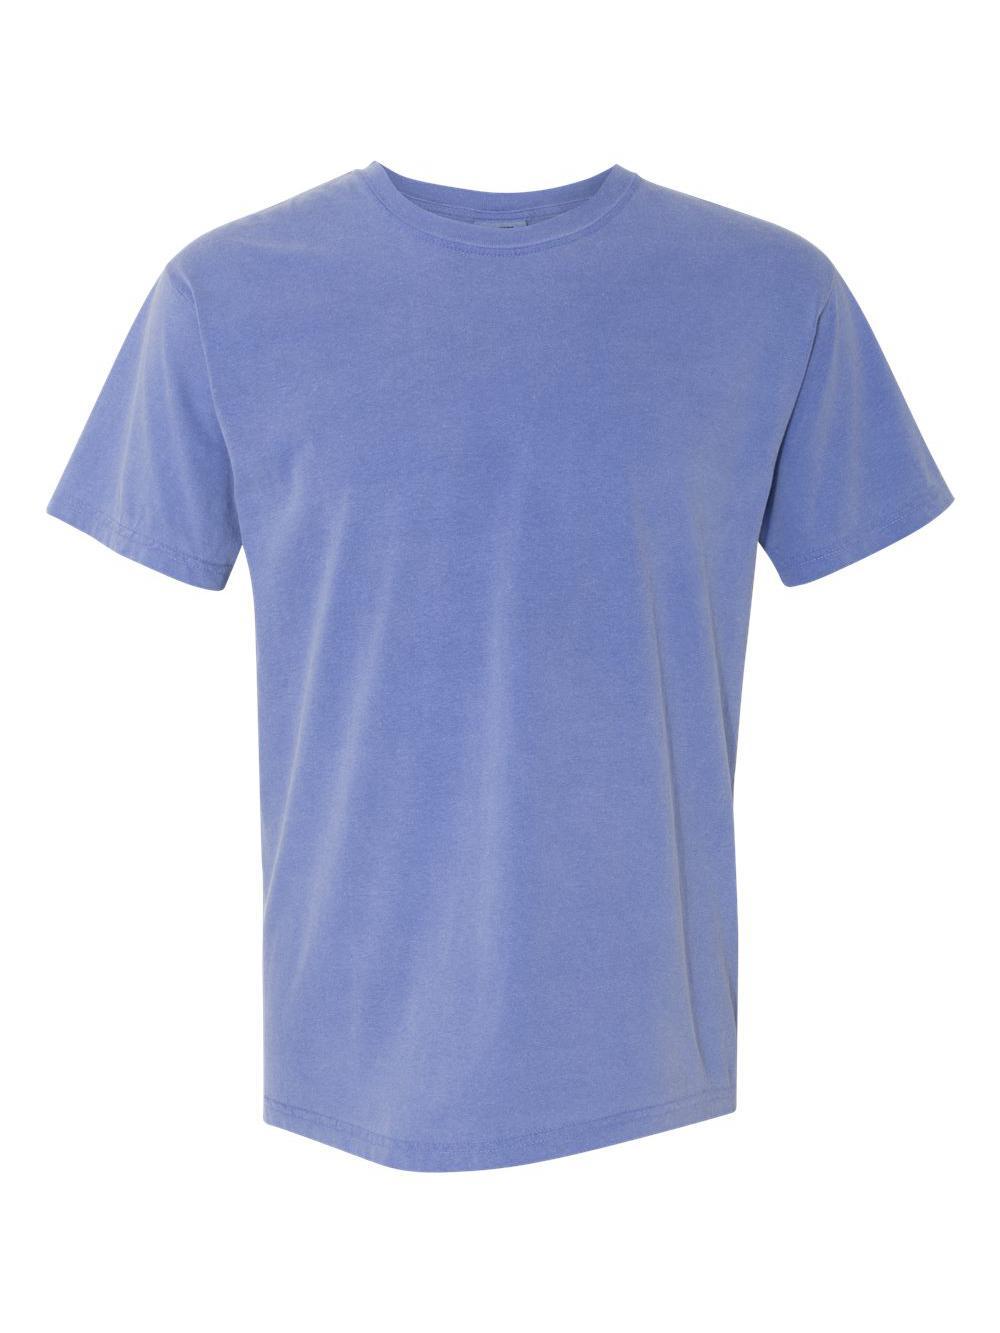 Comfort-Colors-Garment-Dyed-Heavyweight-Ringspun-Short-Sleeve-Shirt-1717 thumbnail 105